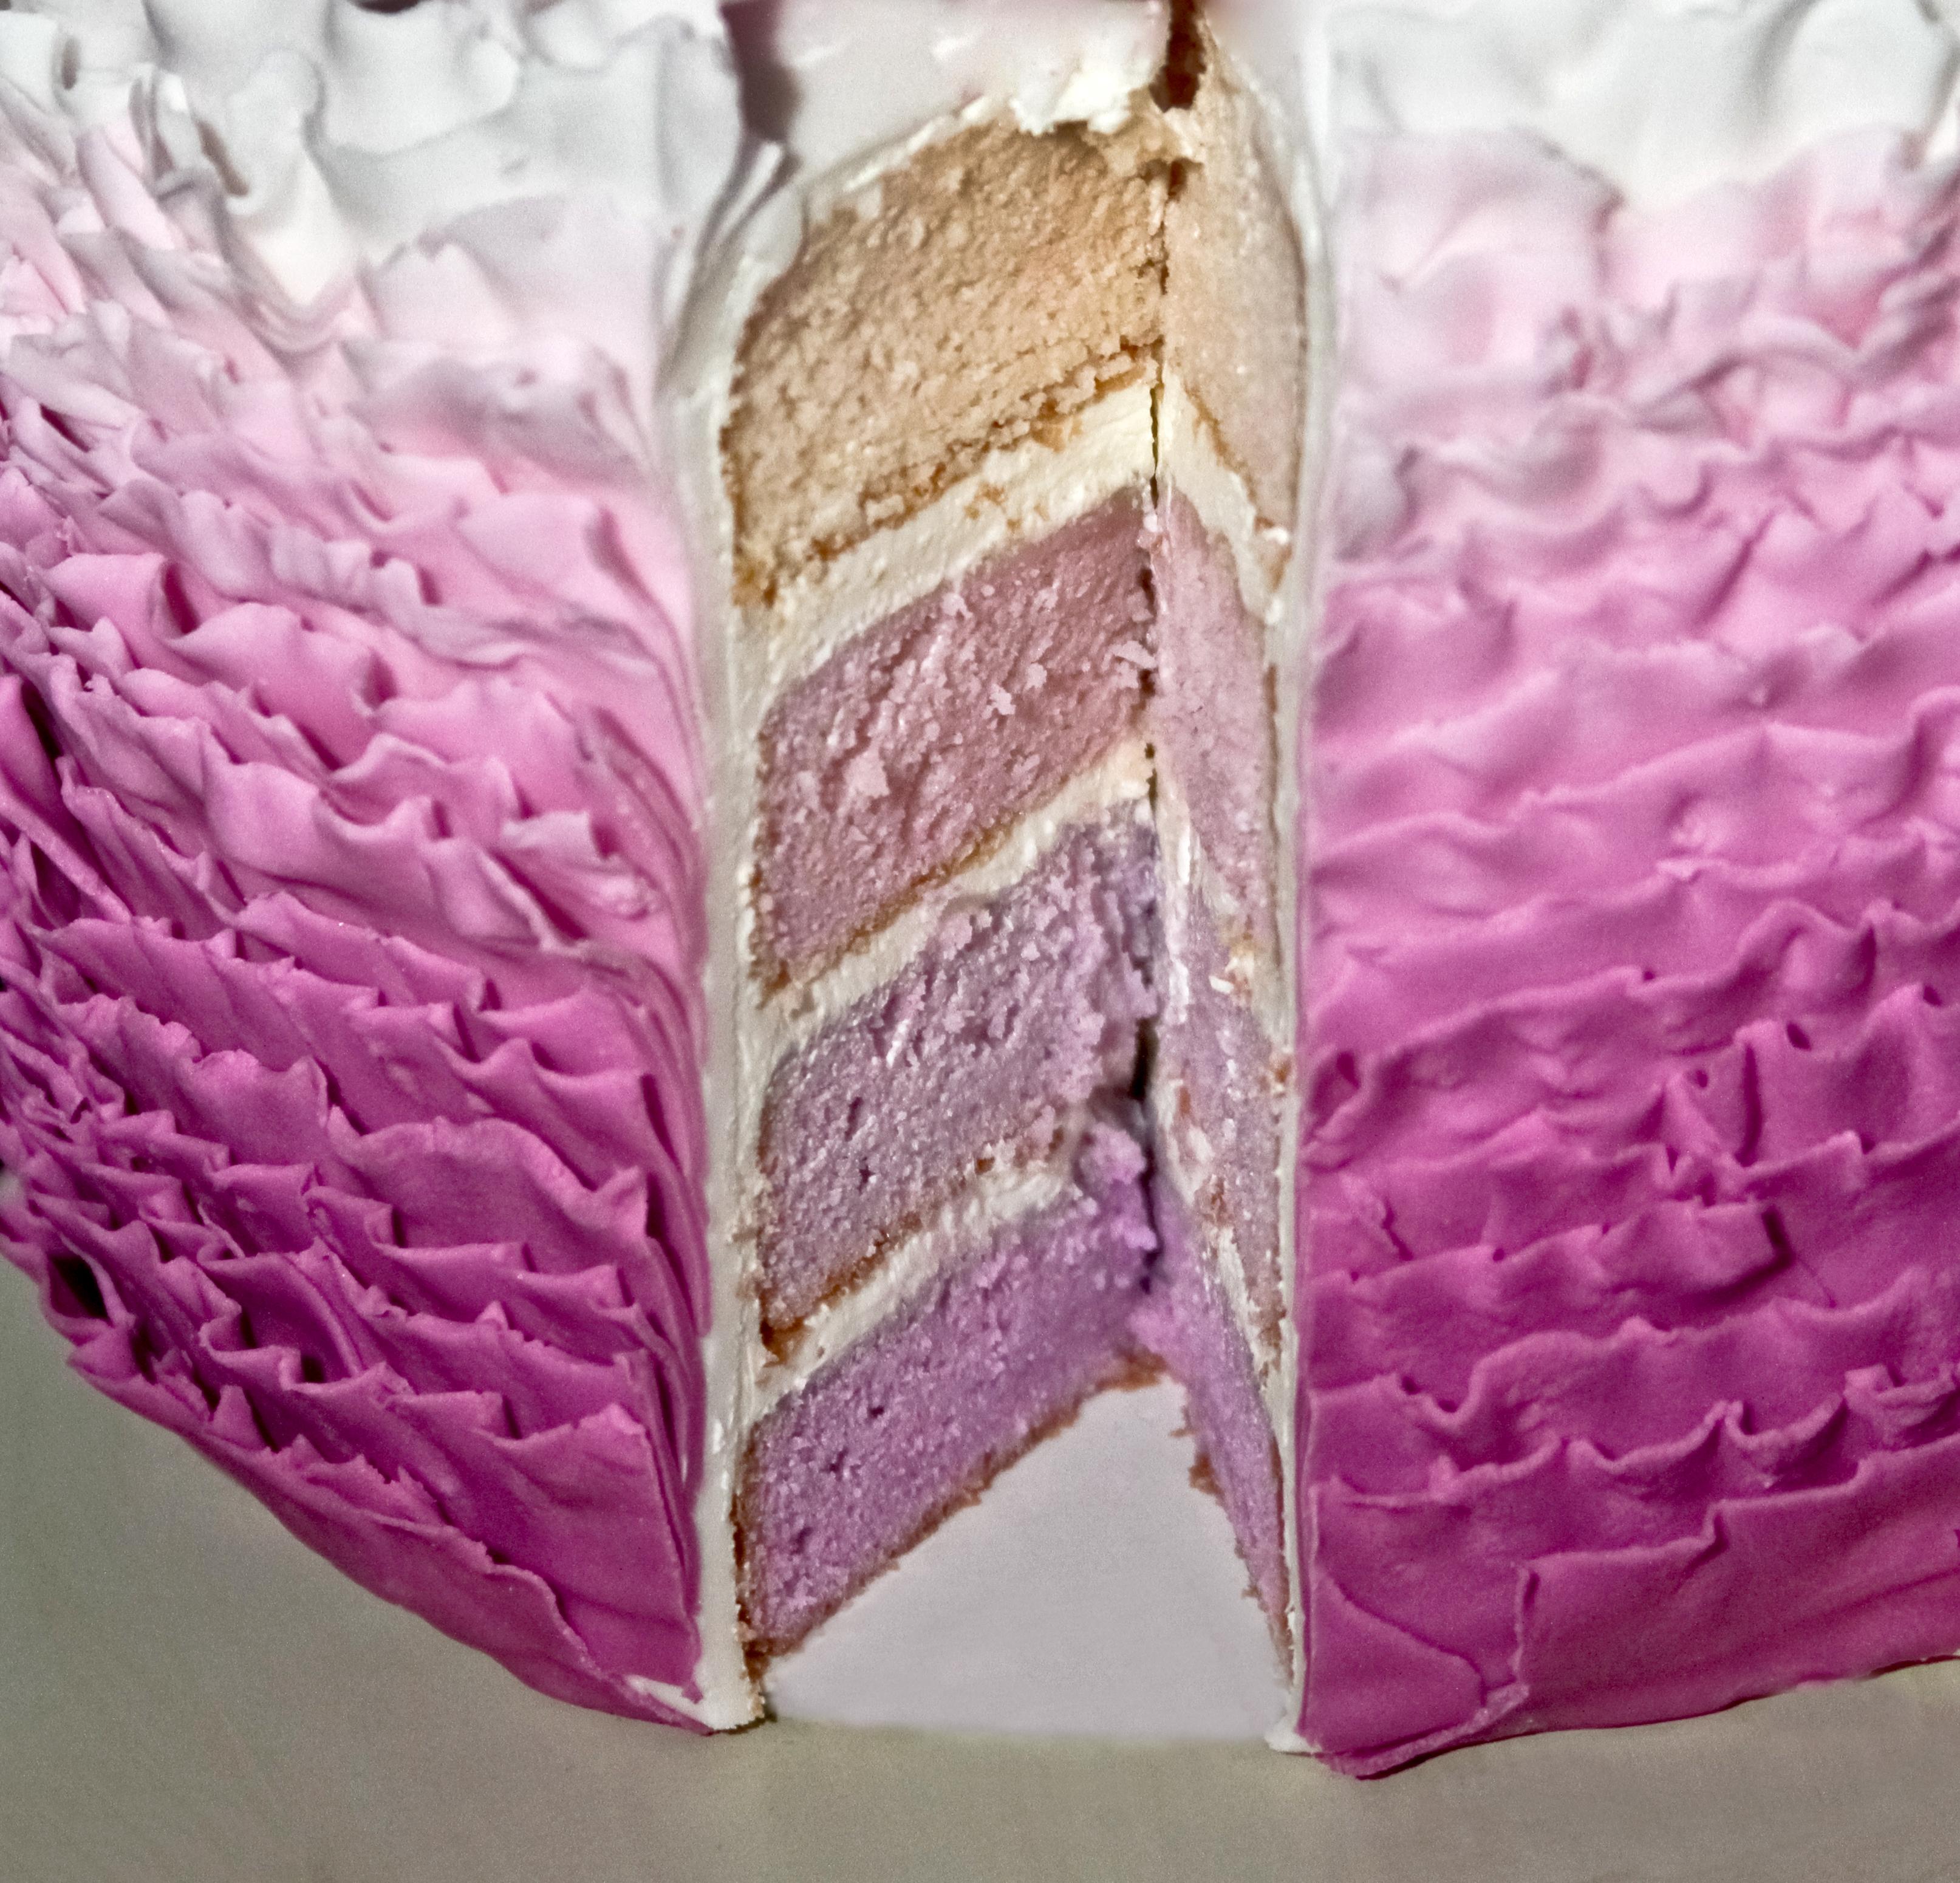 Ombre Fondant Frills Cake